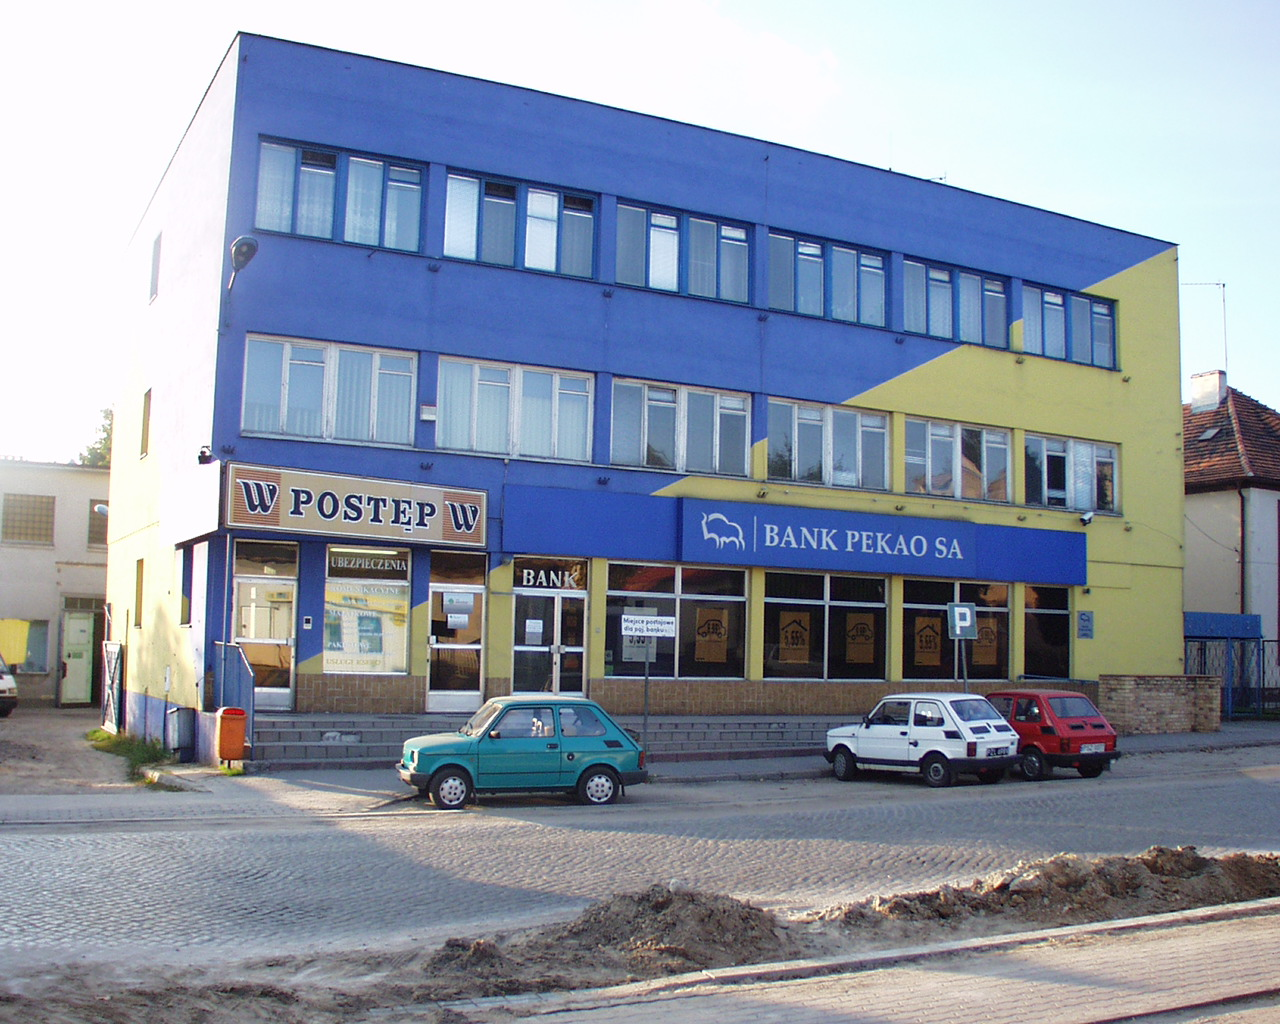 Postęp Wronki - 2004r